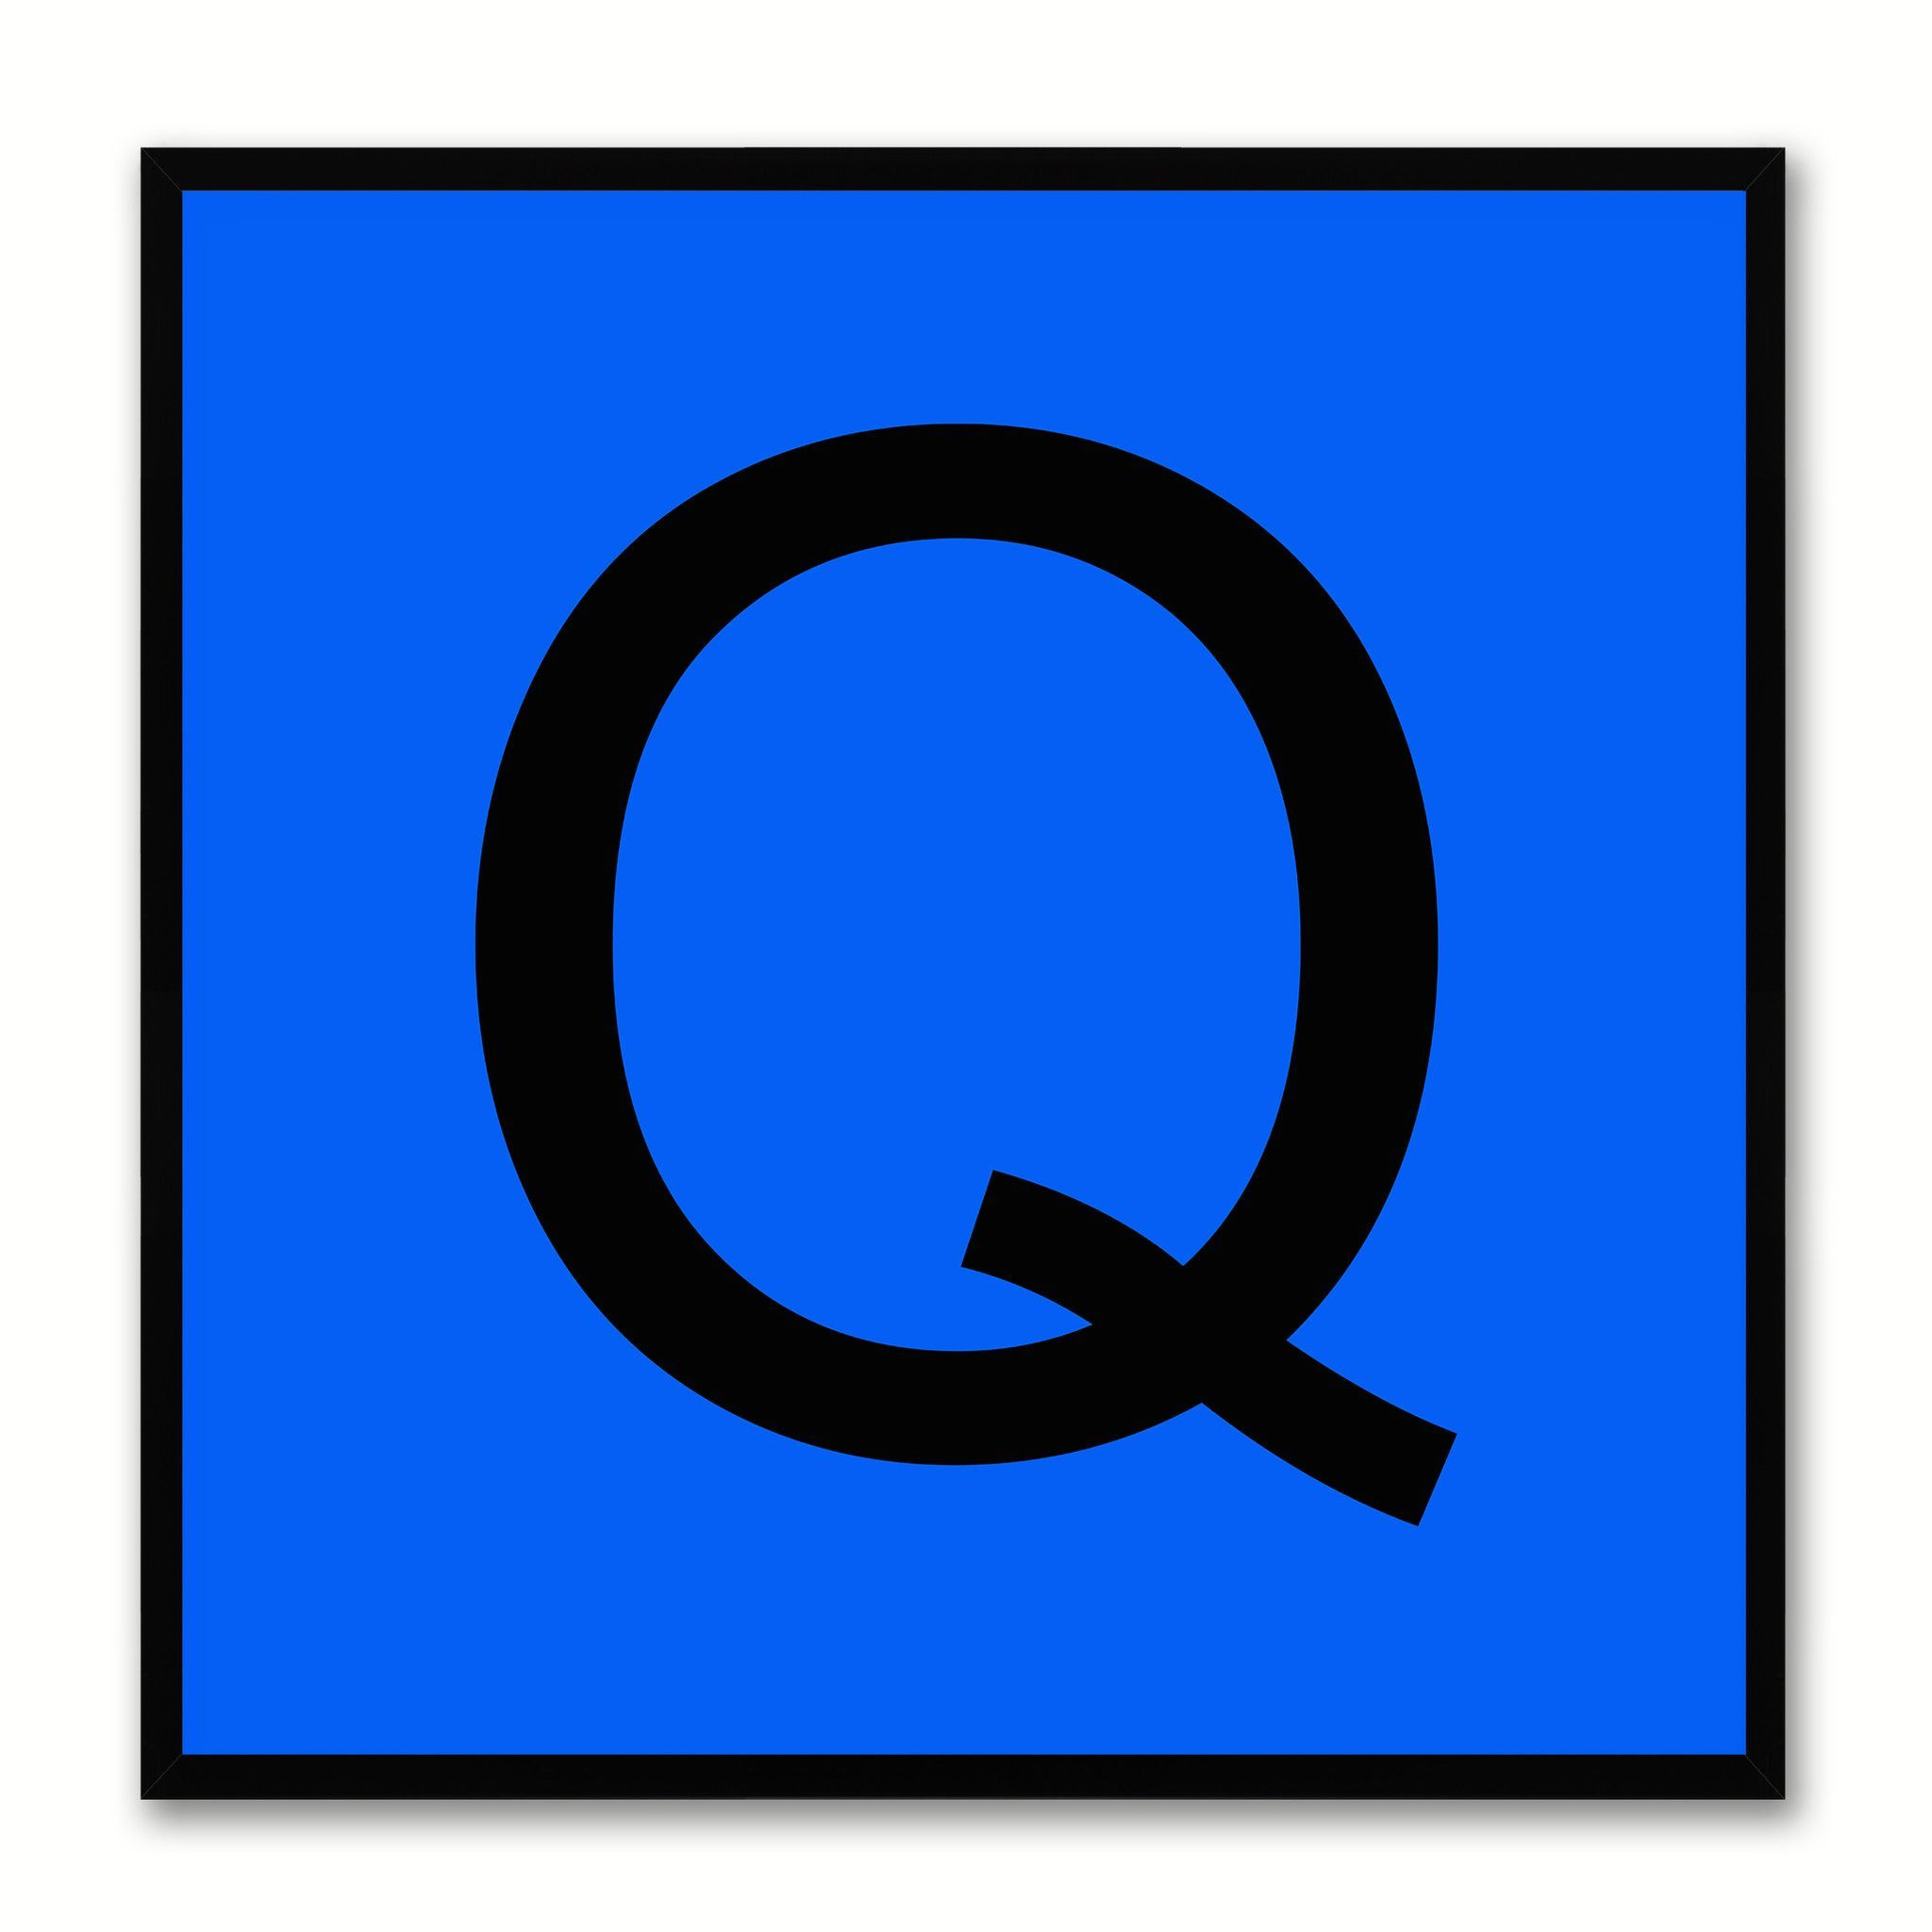 Alphabet Q Blue Canvas Print Black Frame Kids Bedroom Wall Dcor Home Art